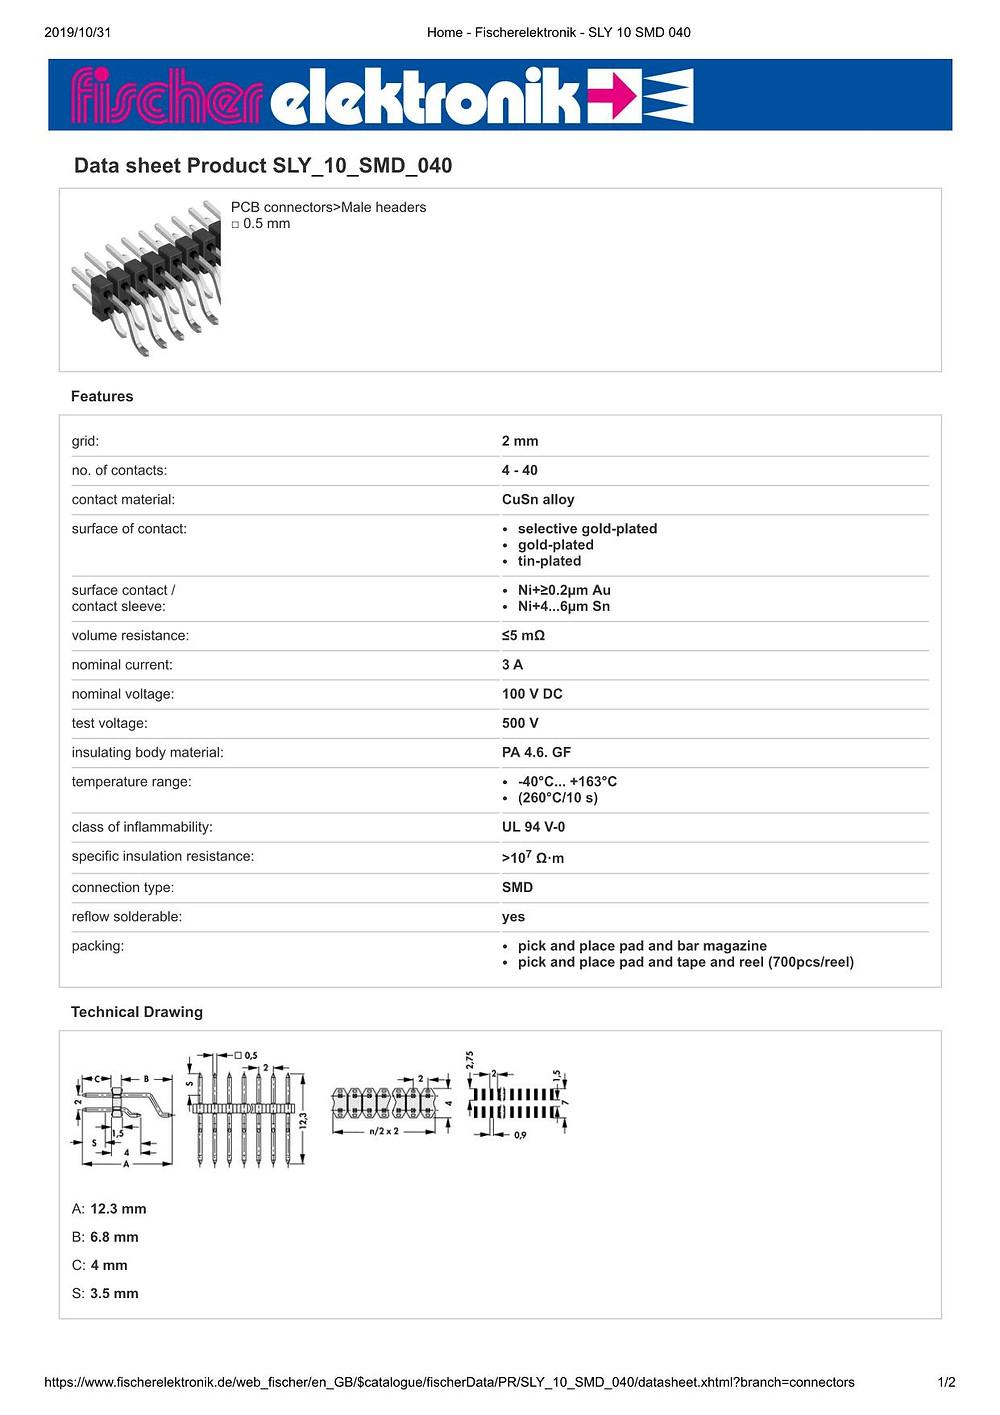 SLY 10 SMD 040 フィッシャー テープ&リール対応 表面実装用ピンヘッダ ライトアングル 2列 2㎜ピッチ □0.5mm (1リール=700個巻)4-40ピン